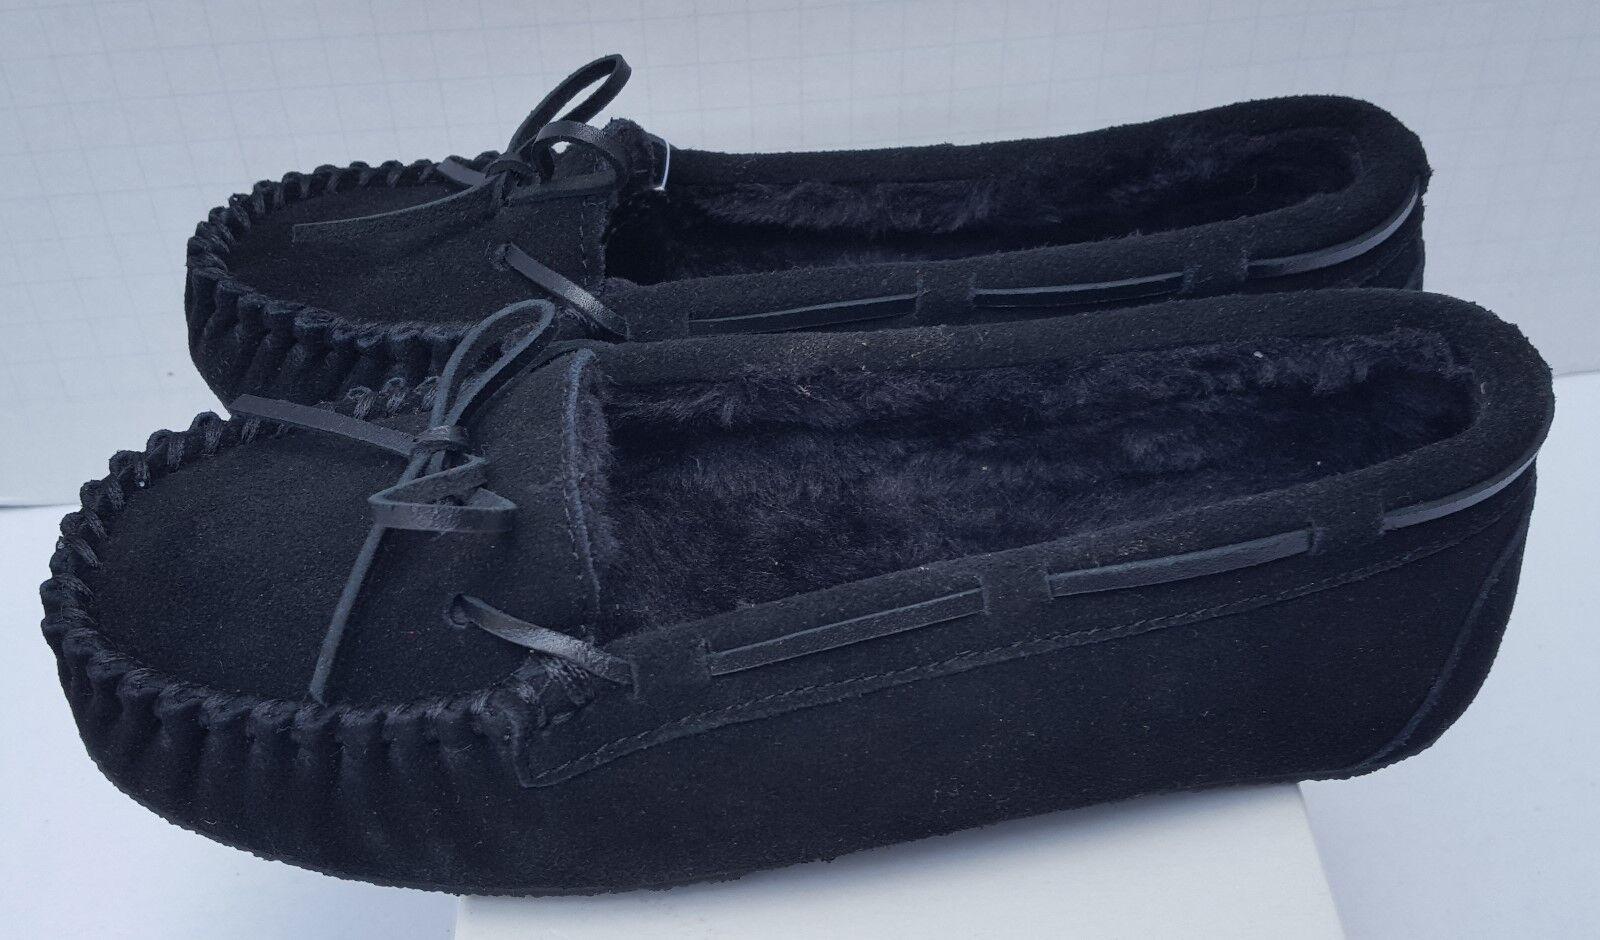 New New New donna Minnetonka scarpe Slip On Loafers & Moccasins Sheepskin nero Allie 7 c221cc